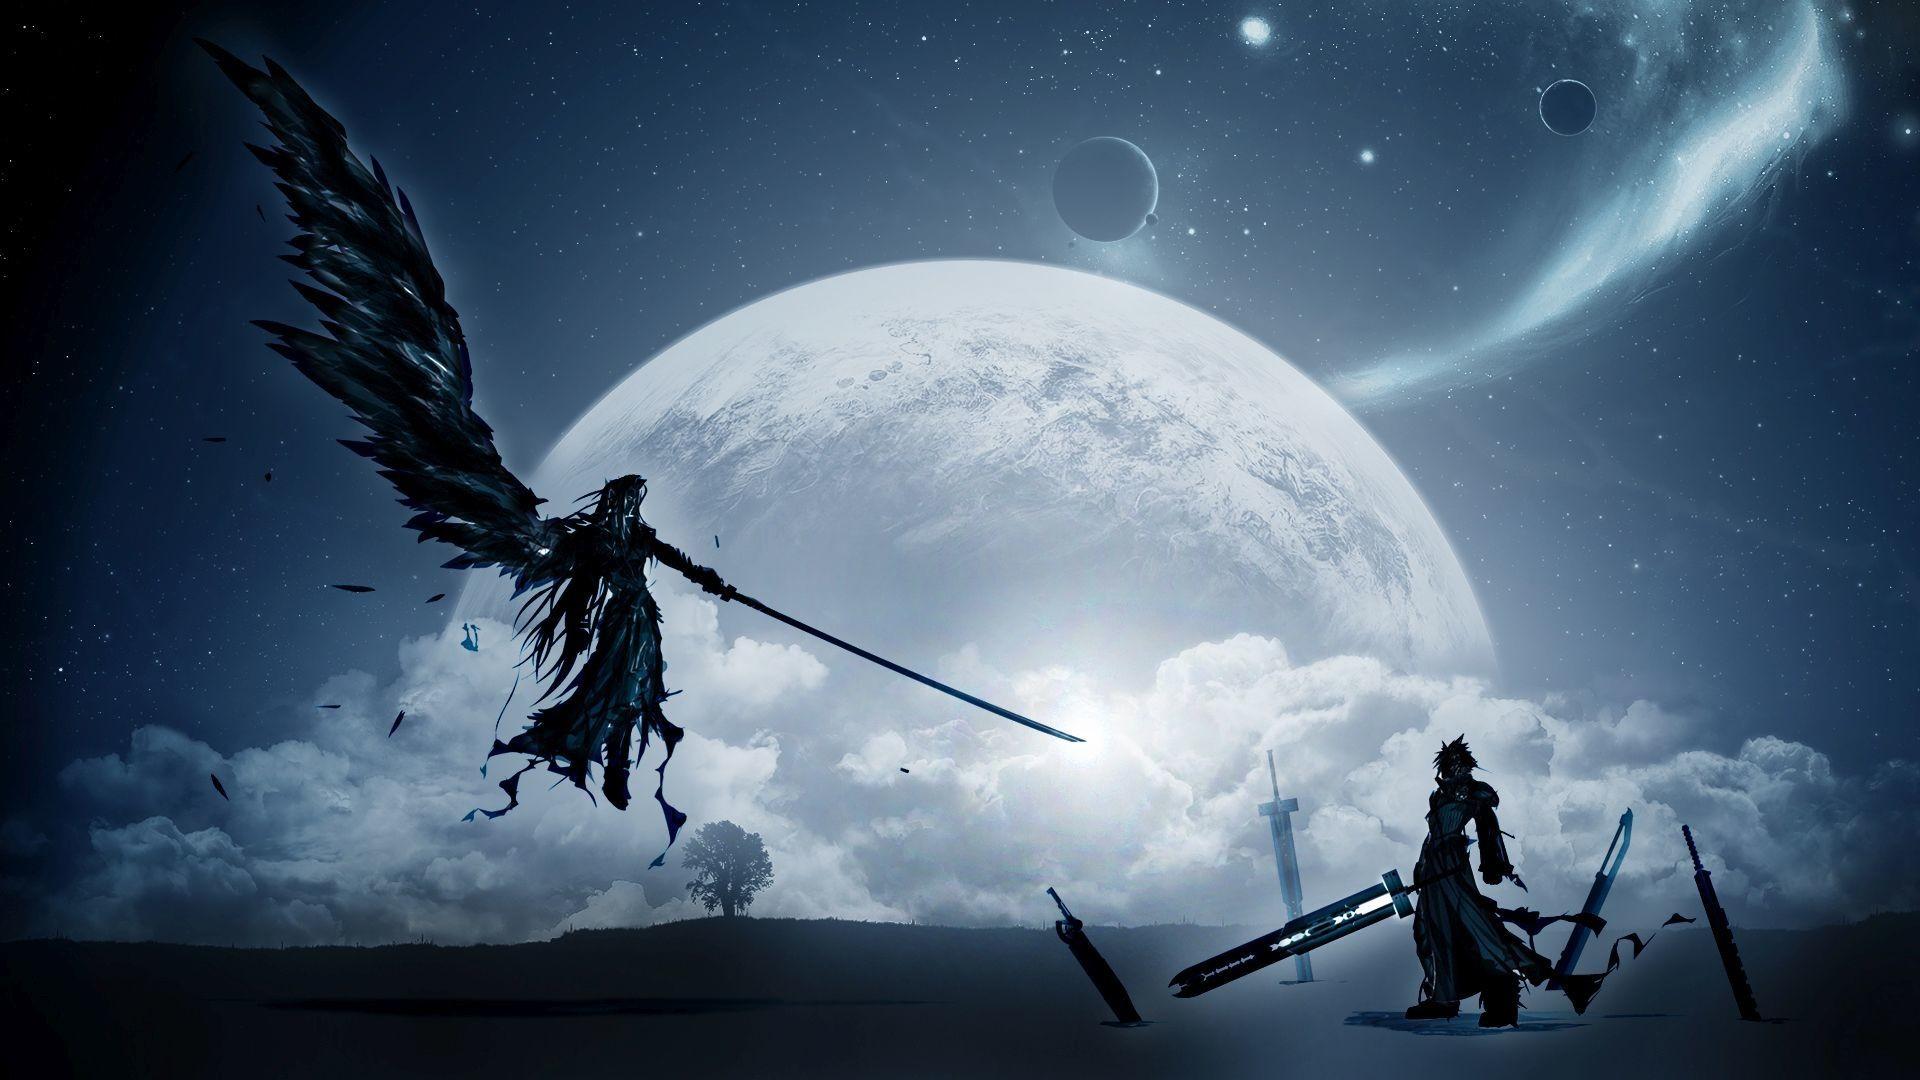 HD Final Fantasy Wallpaper (69+ Images